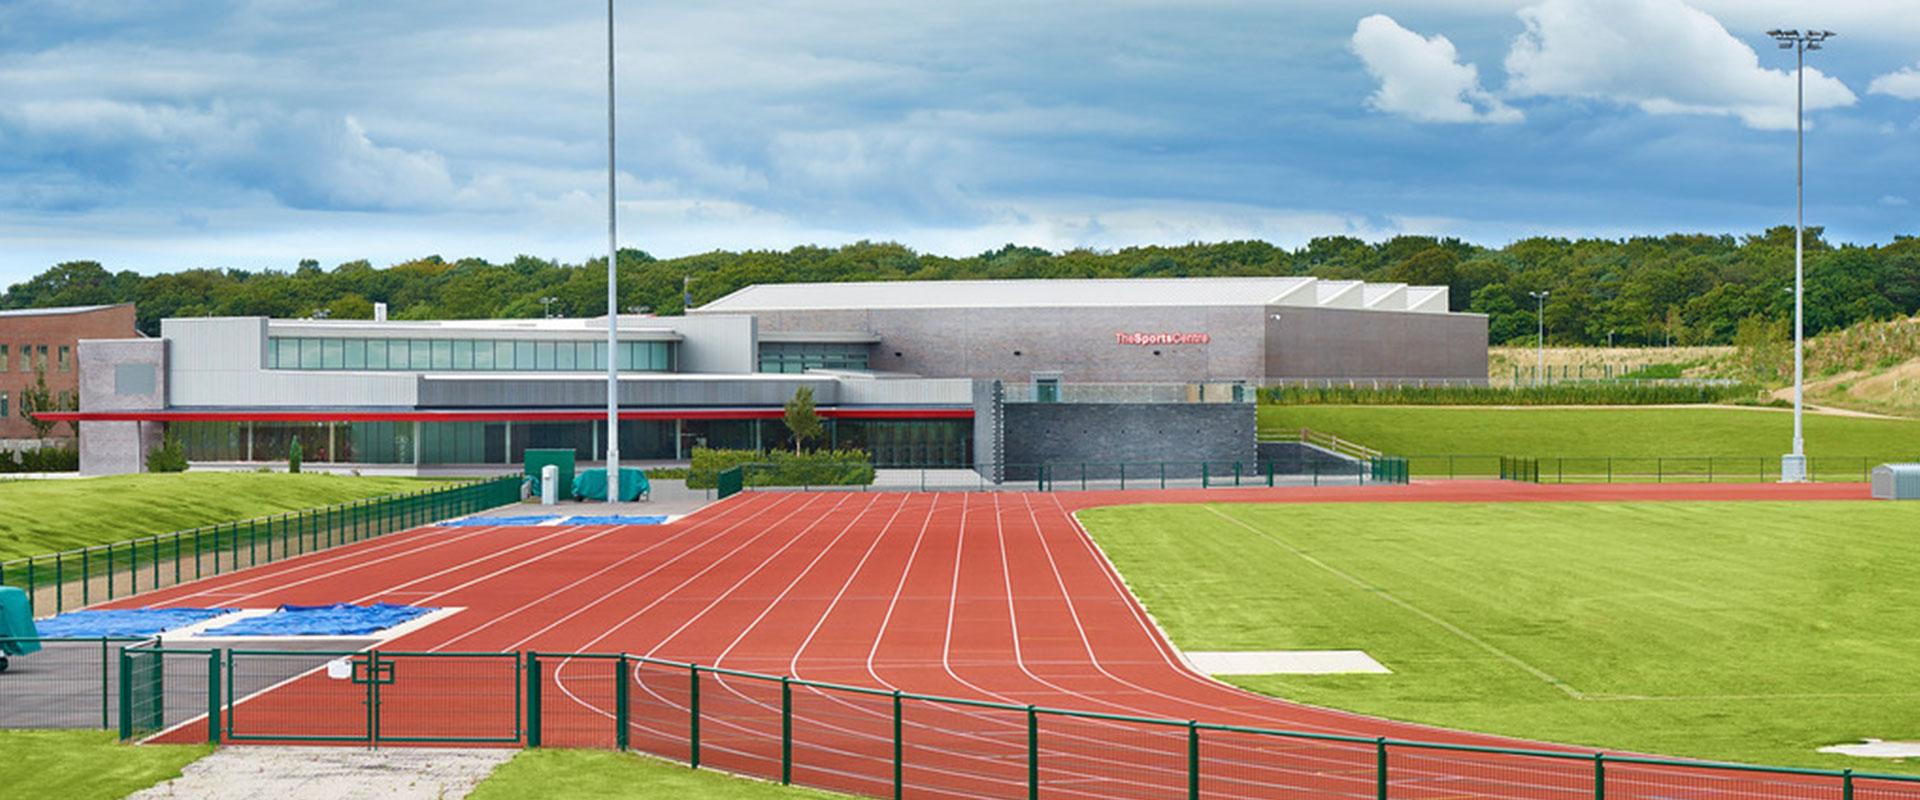 Edge Hill Sports Centre John Turner Construction Project